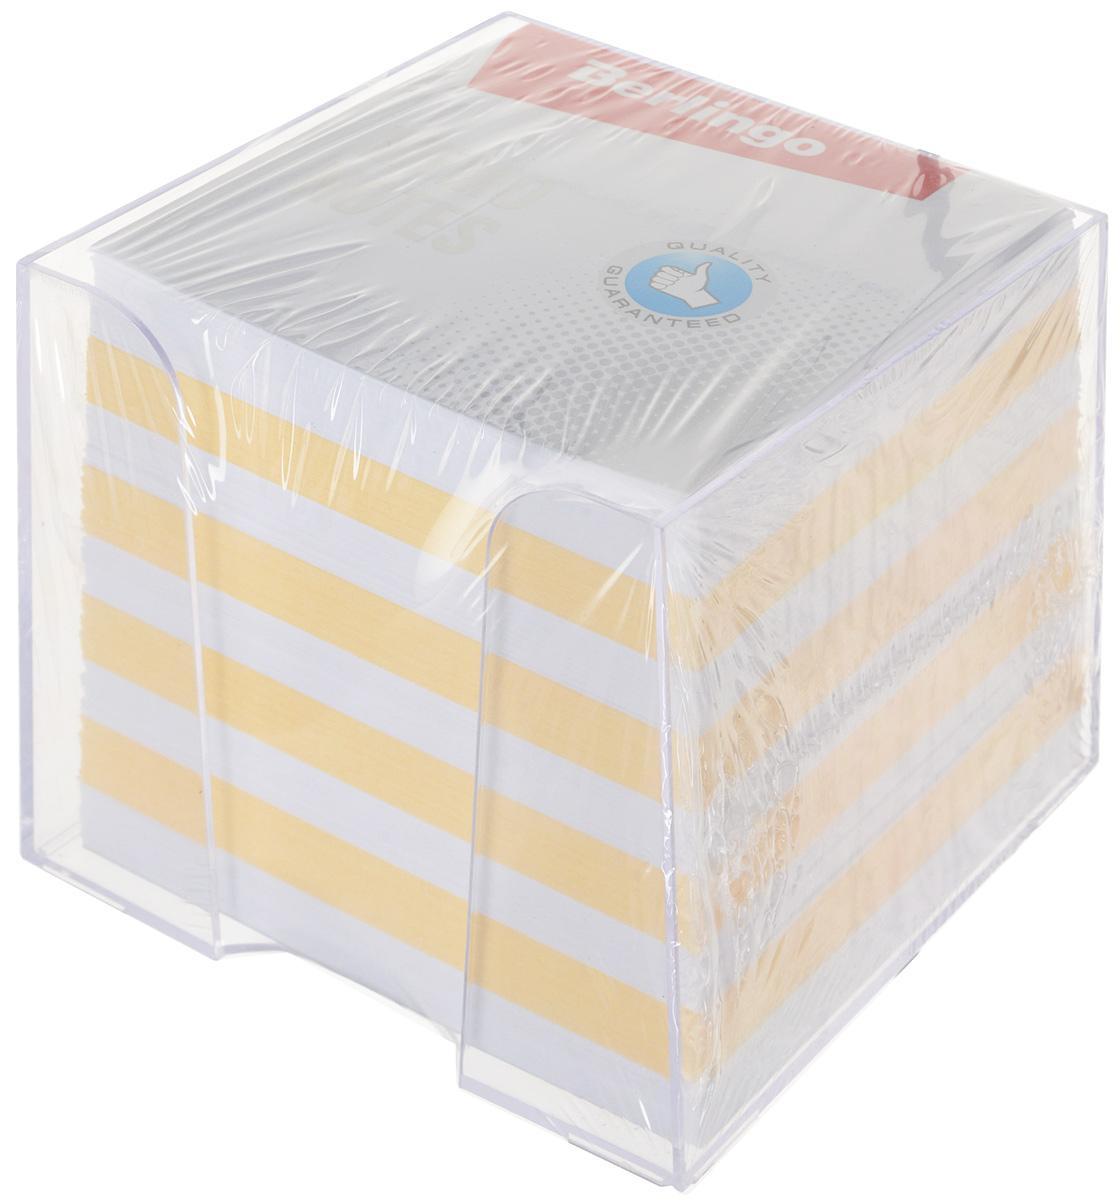 Berlingo Бумага для заметок Standard 9 х 9 х 9 см в пластиковой подставке цвет белый желтый 1000 стакан для ванной umbra droplet цвет дымчатый 9 3 х 9 6 х 9 6 см